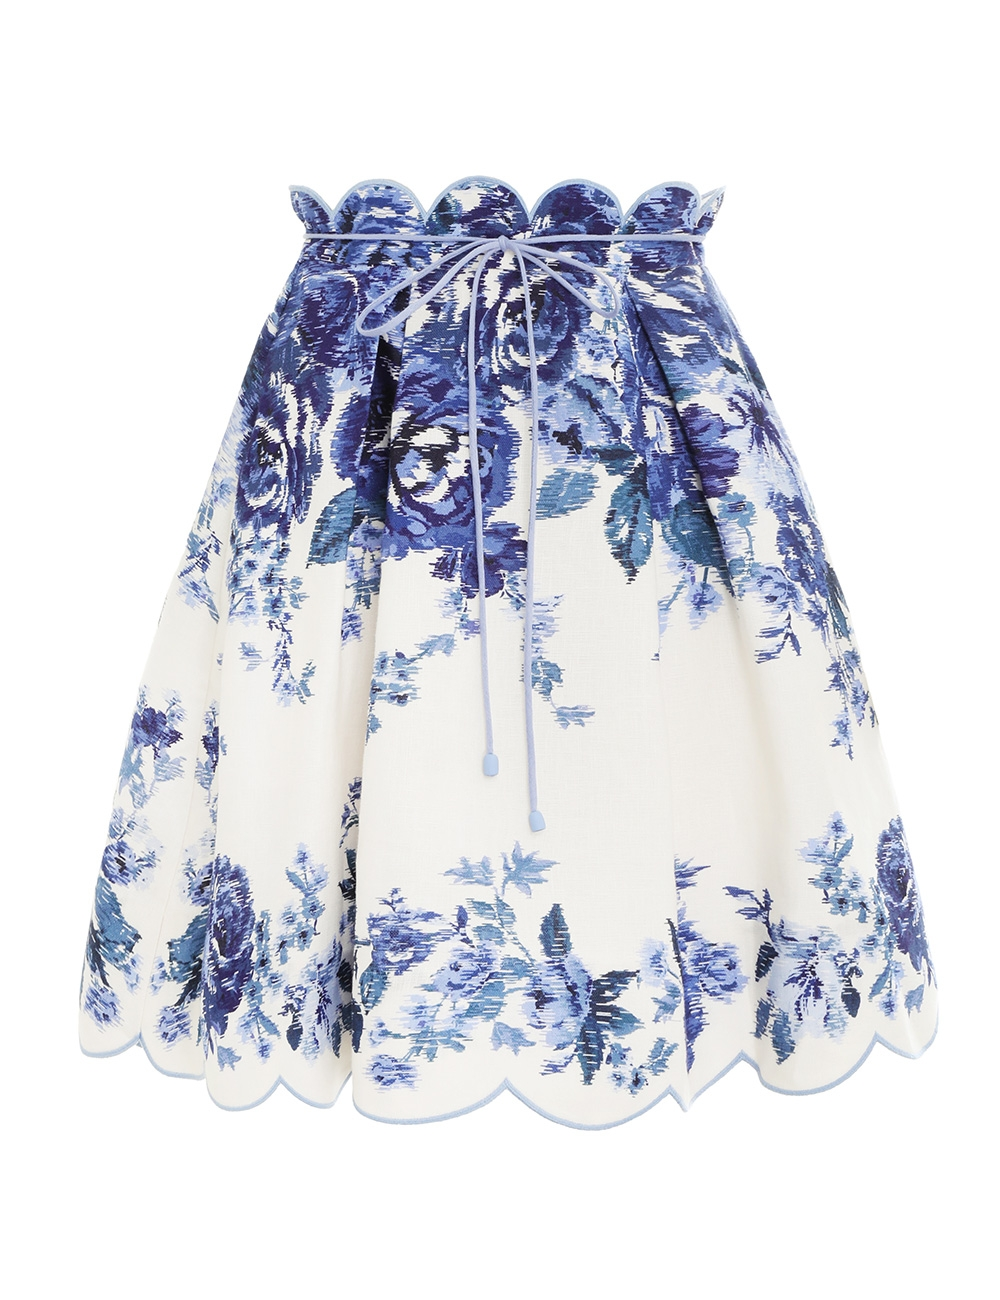 Aliane Scallop Skirt